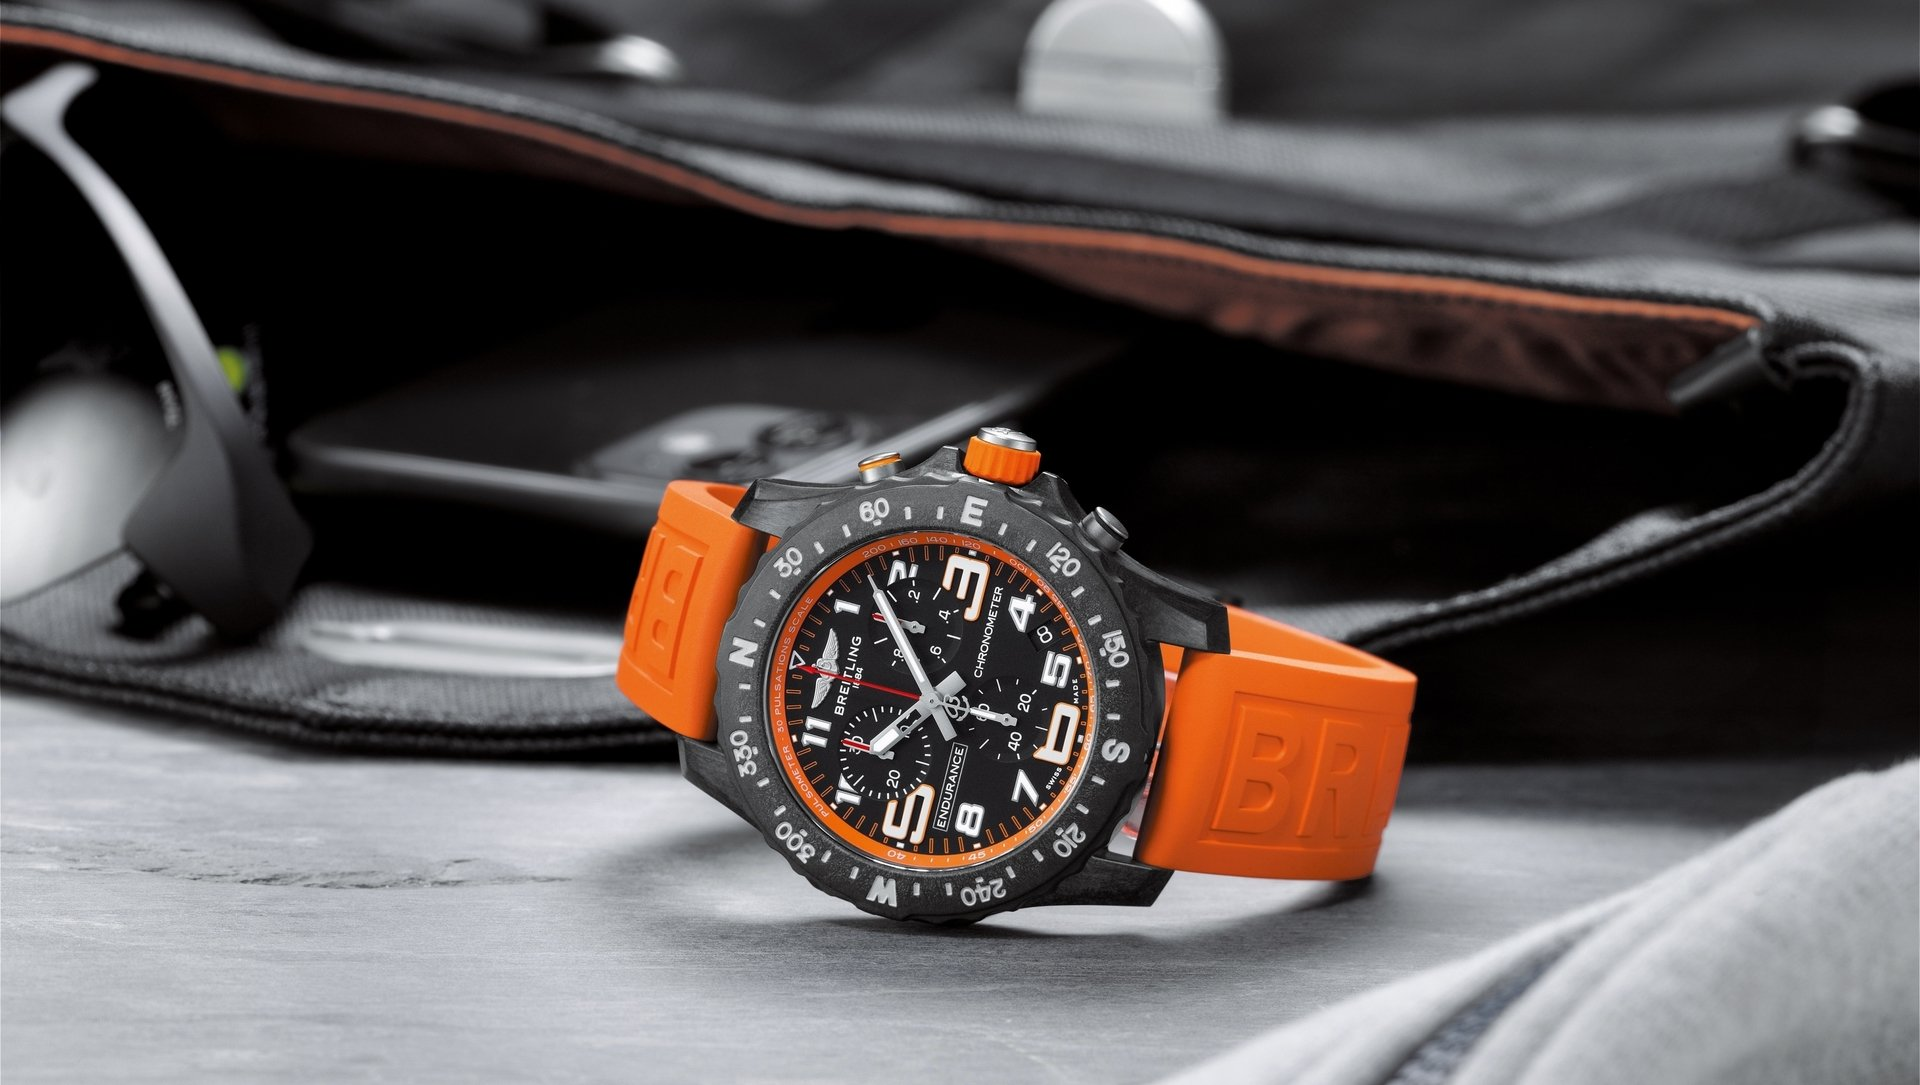 07_endurance-pro-with-an-orange-inner-bezel-and-rubber-strap.jpg